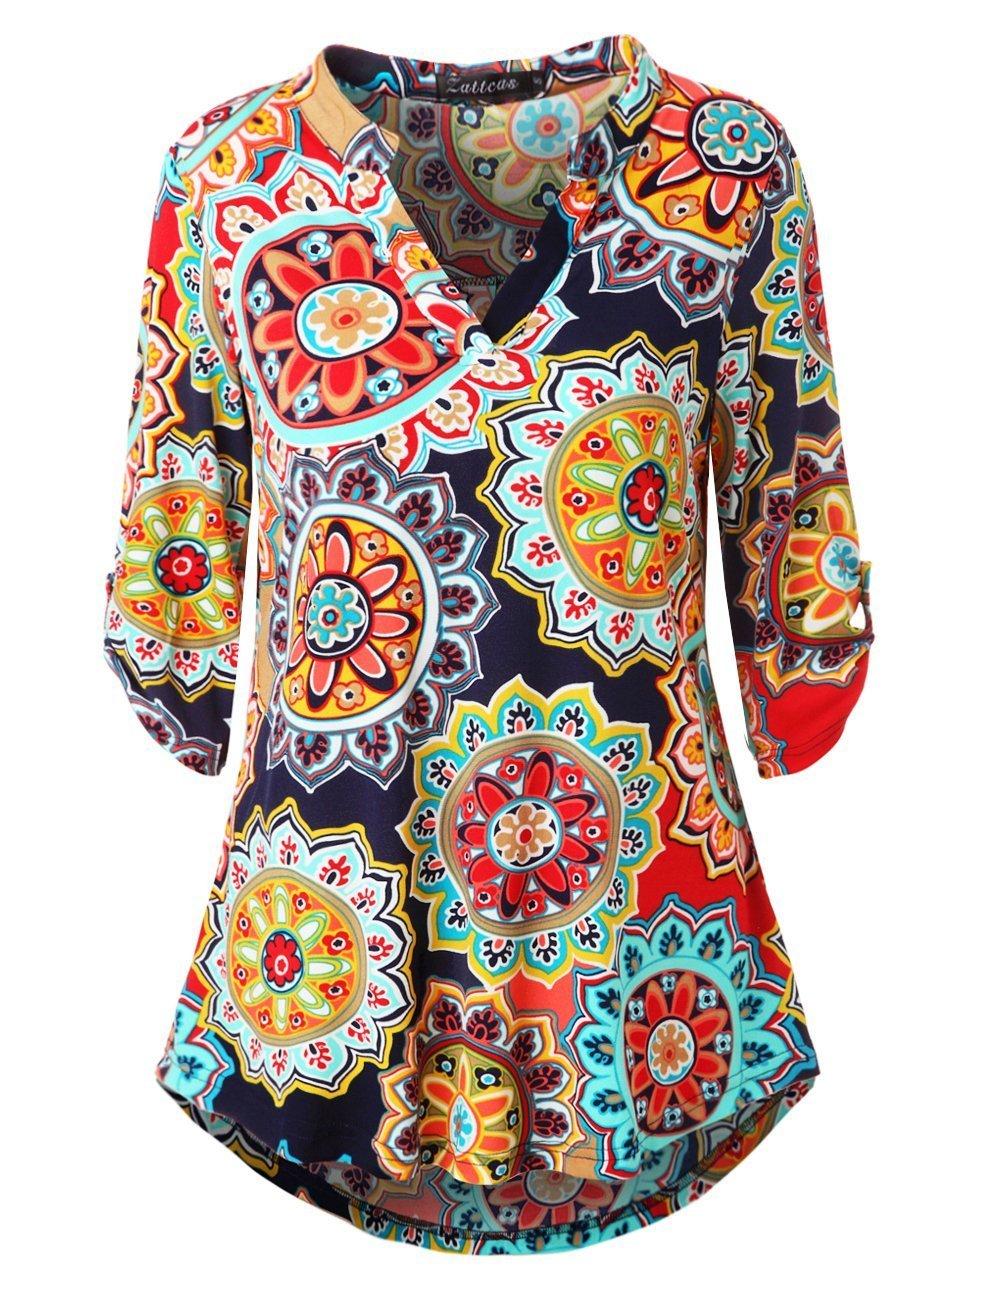 d29212127266e Galleon - Zattcas Womens Floral Printed Tunic Shirts 3 4 Roll Sleeve Notch  Neck Tunic Top (Medium